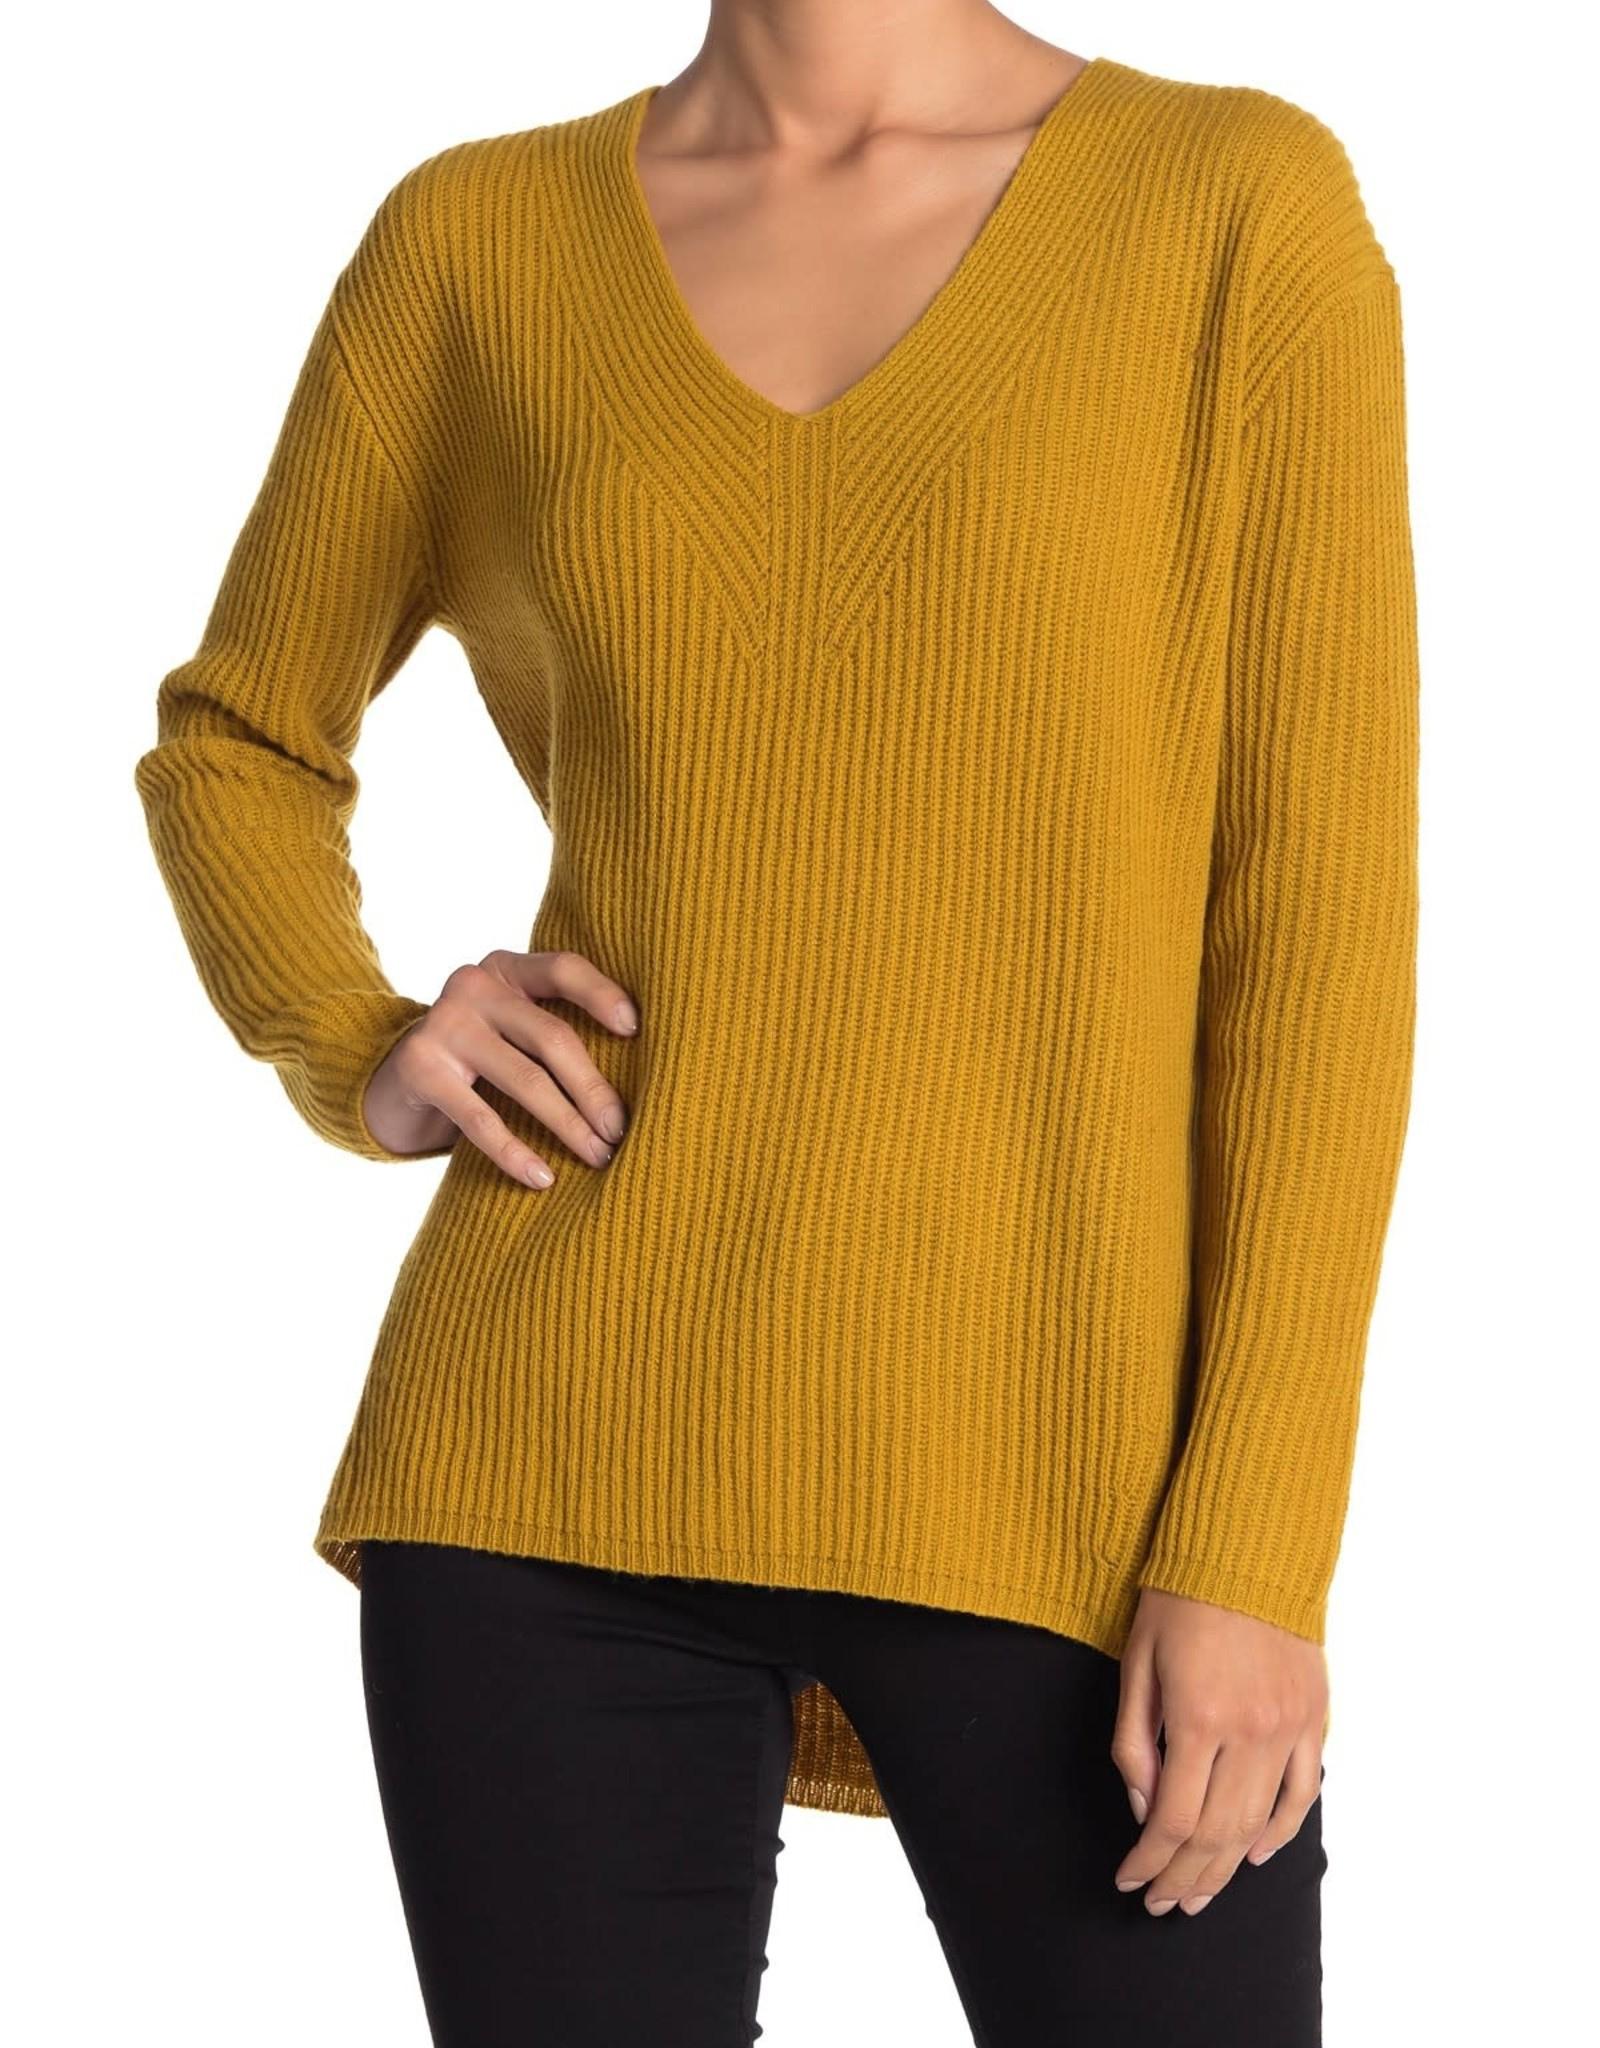 Madewell Madewell woolside Wool Blend Pullover Sweater Sz XL